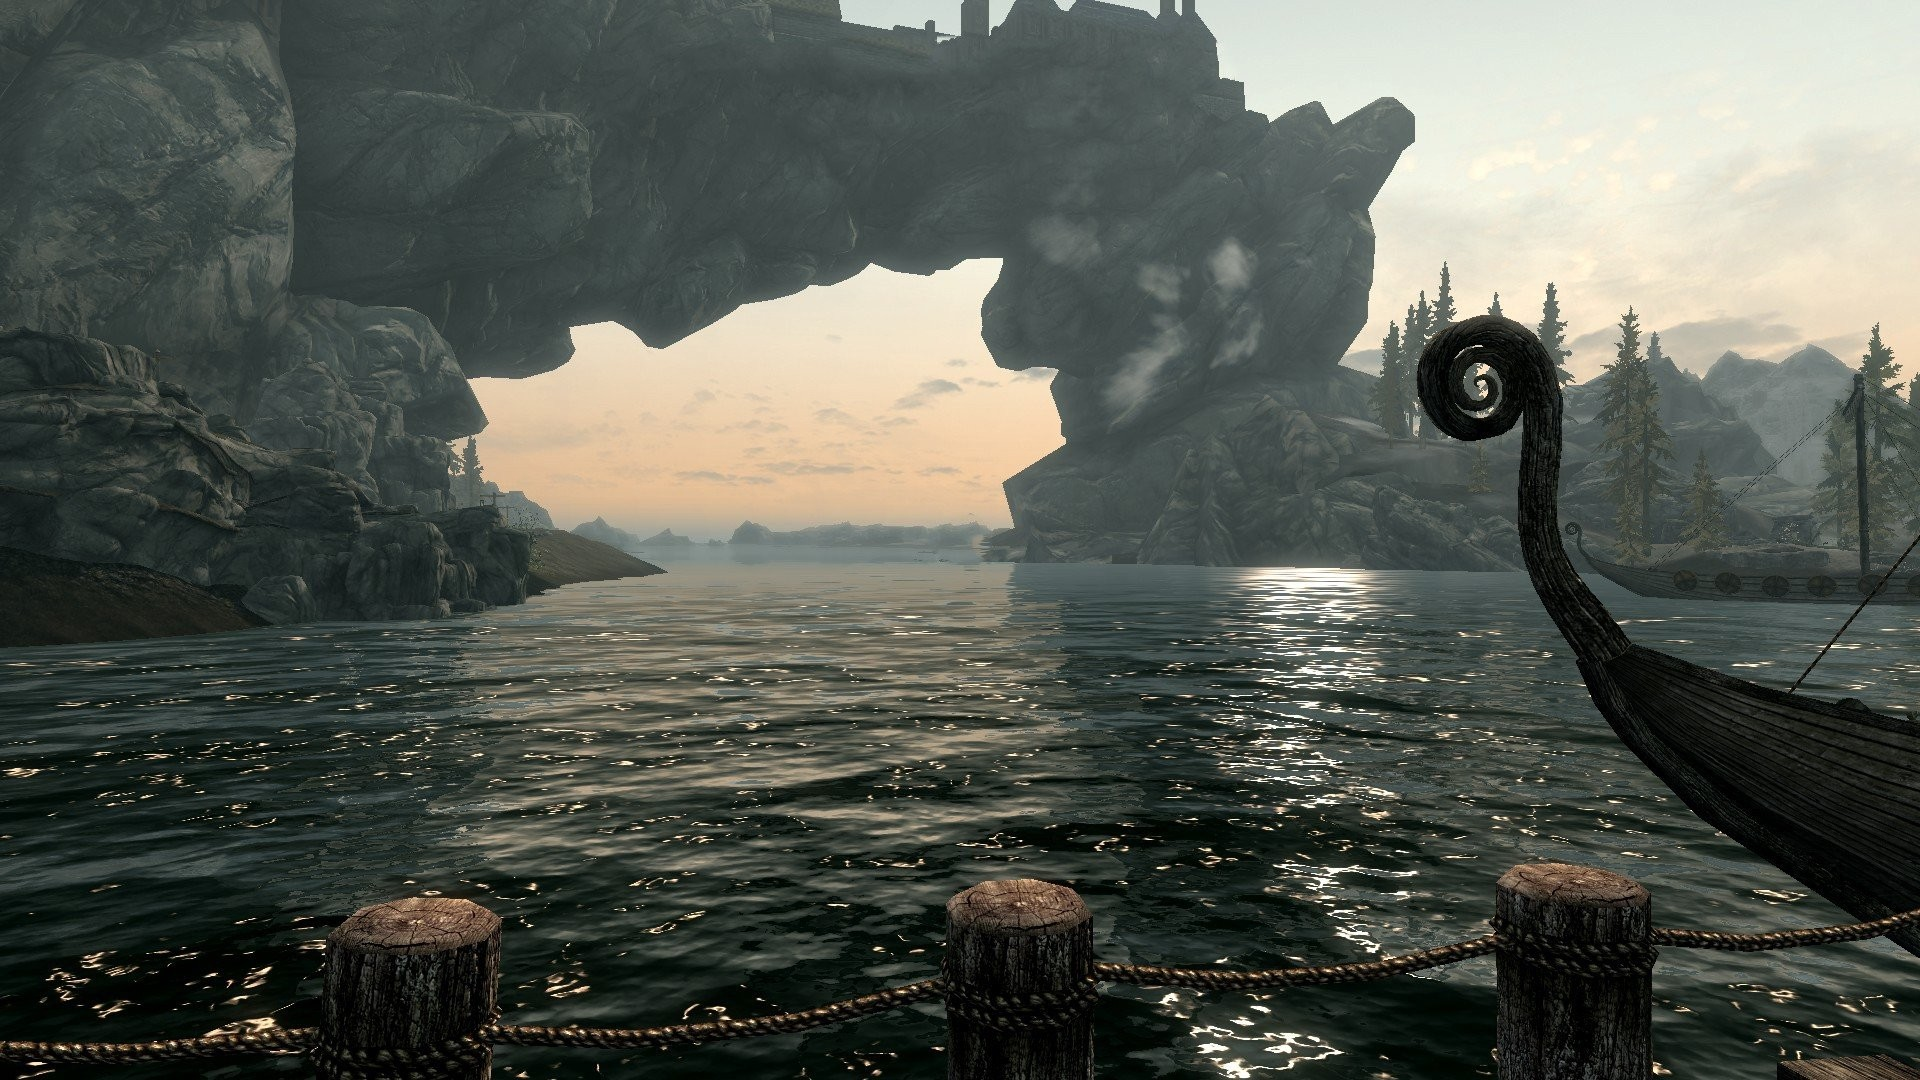 Water boats lakes The Elder Scrolls V: Skyrim wallpaper      243165   WallpaperUP